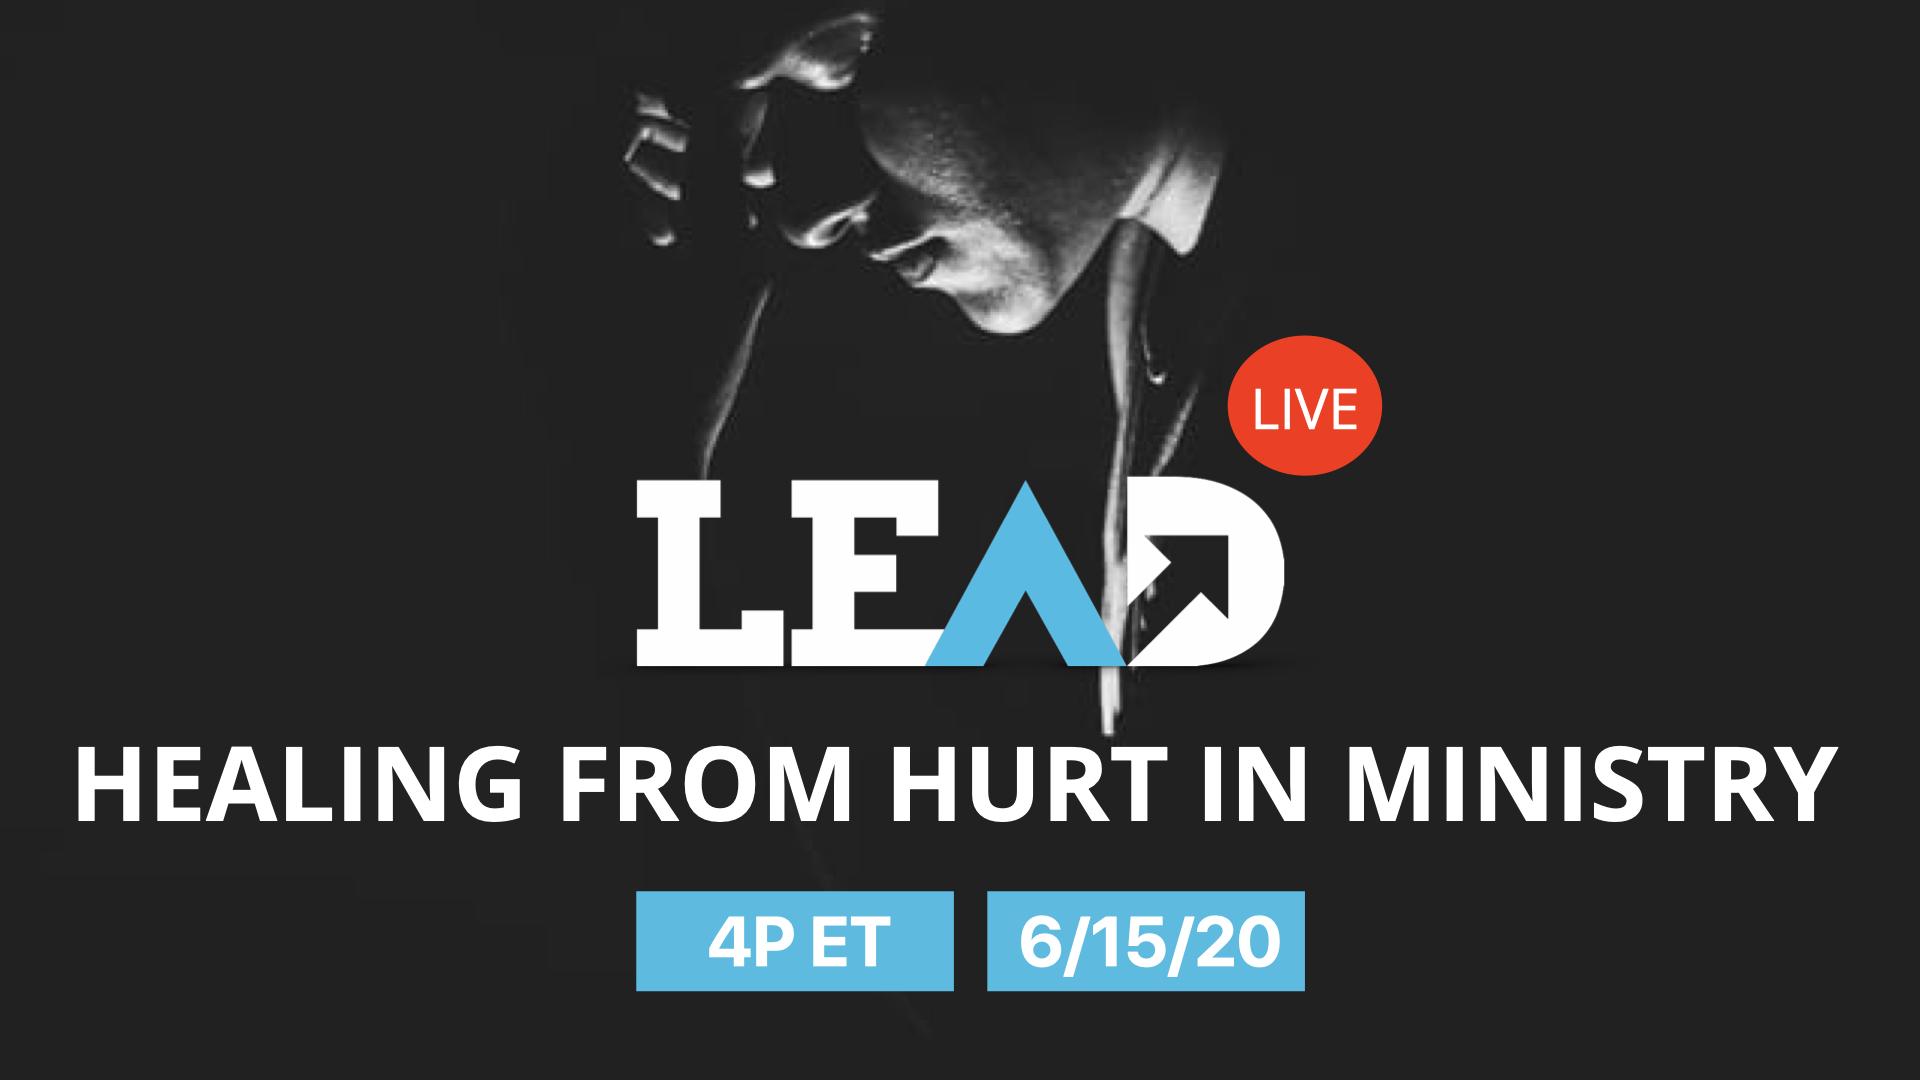 LEAD Live: Healing Ministry Hurt